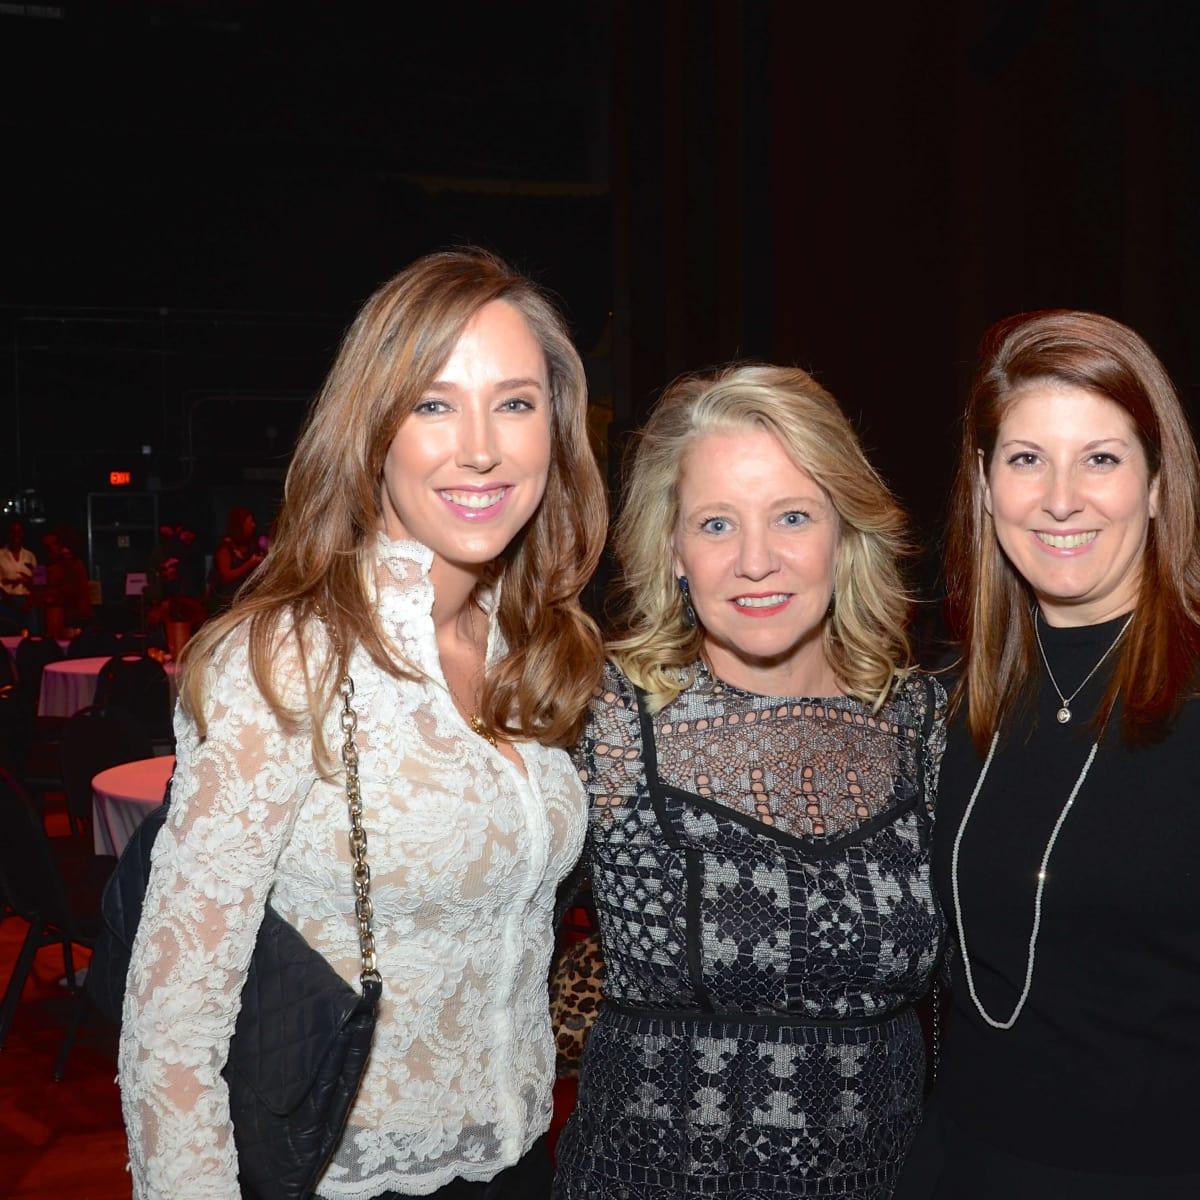 Houston, Society for Performing Arts gala, Nov. 2016, Ronel Golden, Elizabeth Vail, Christina Sacco